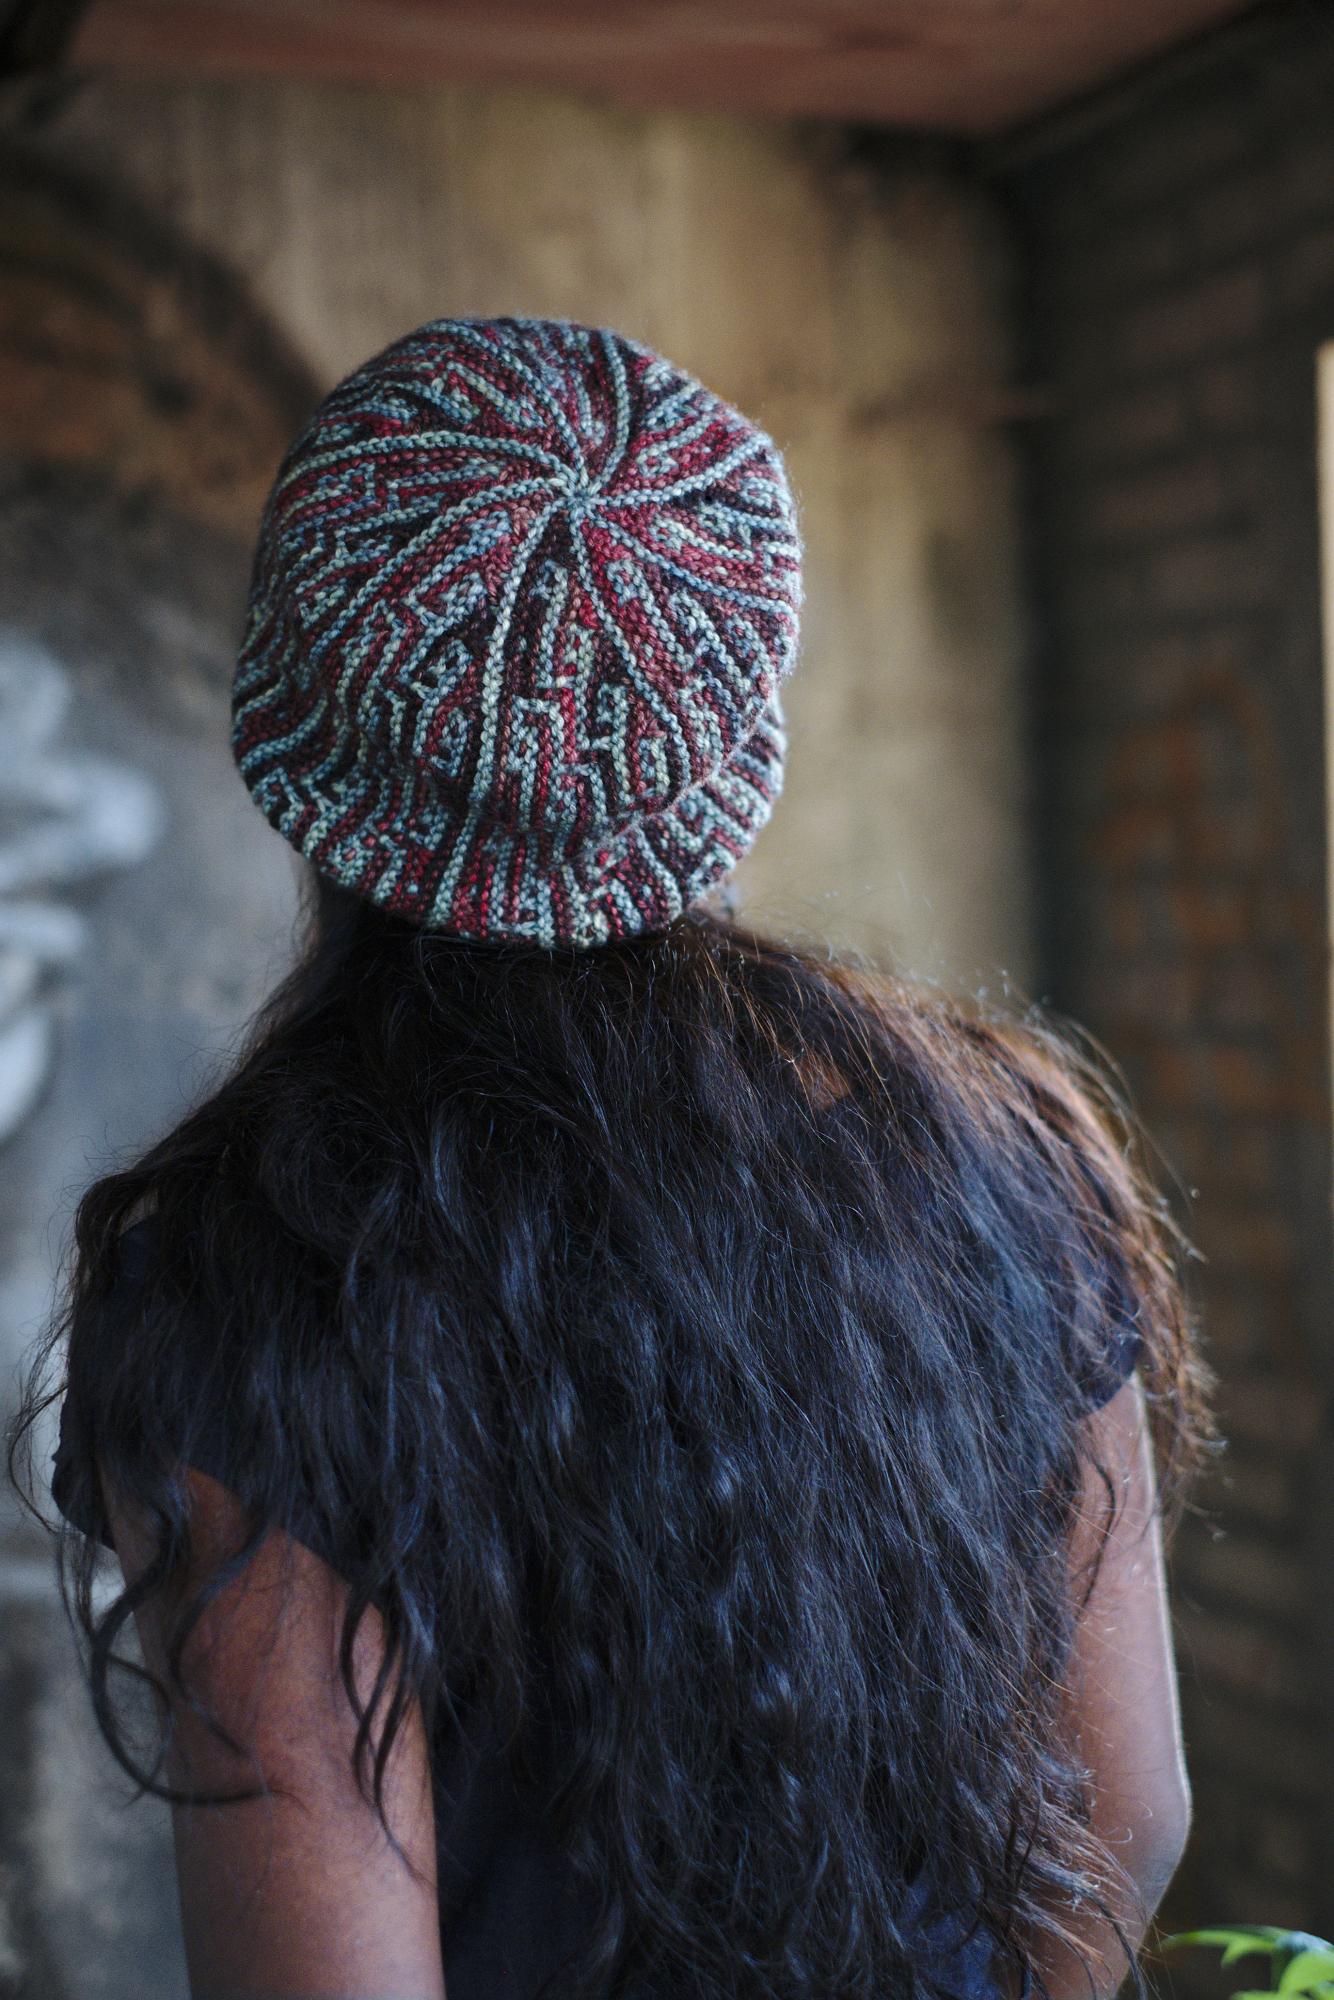 sideways knit mosaic hat knitting pattern for dk weight yarn